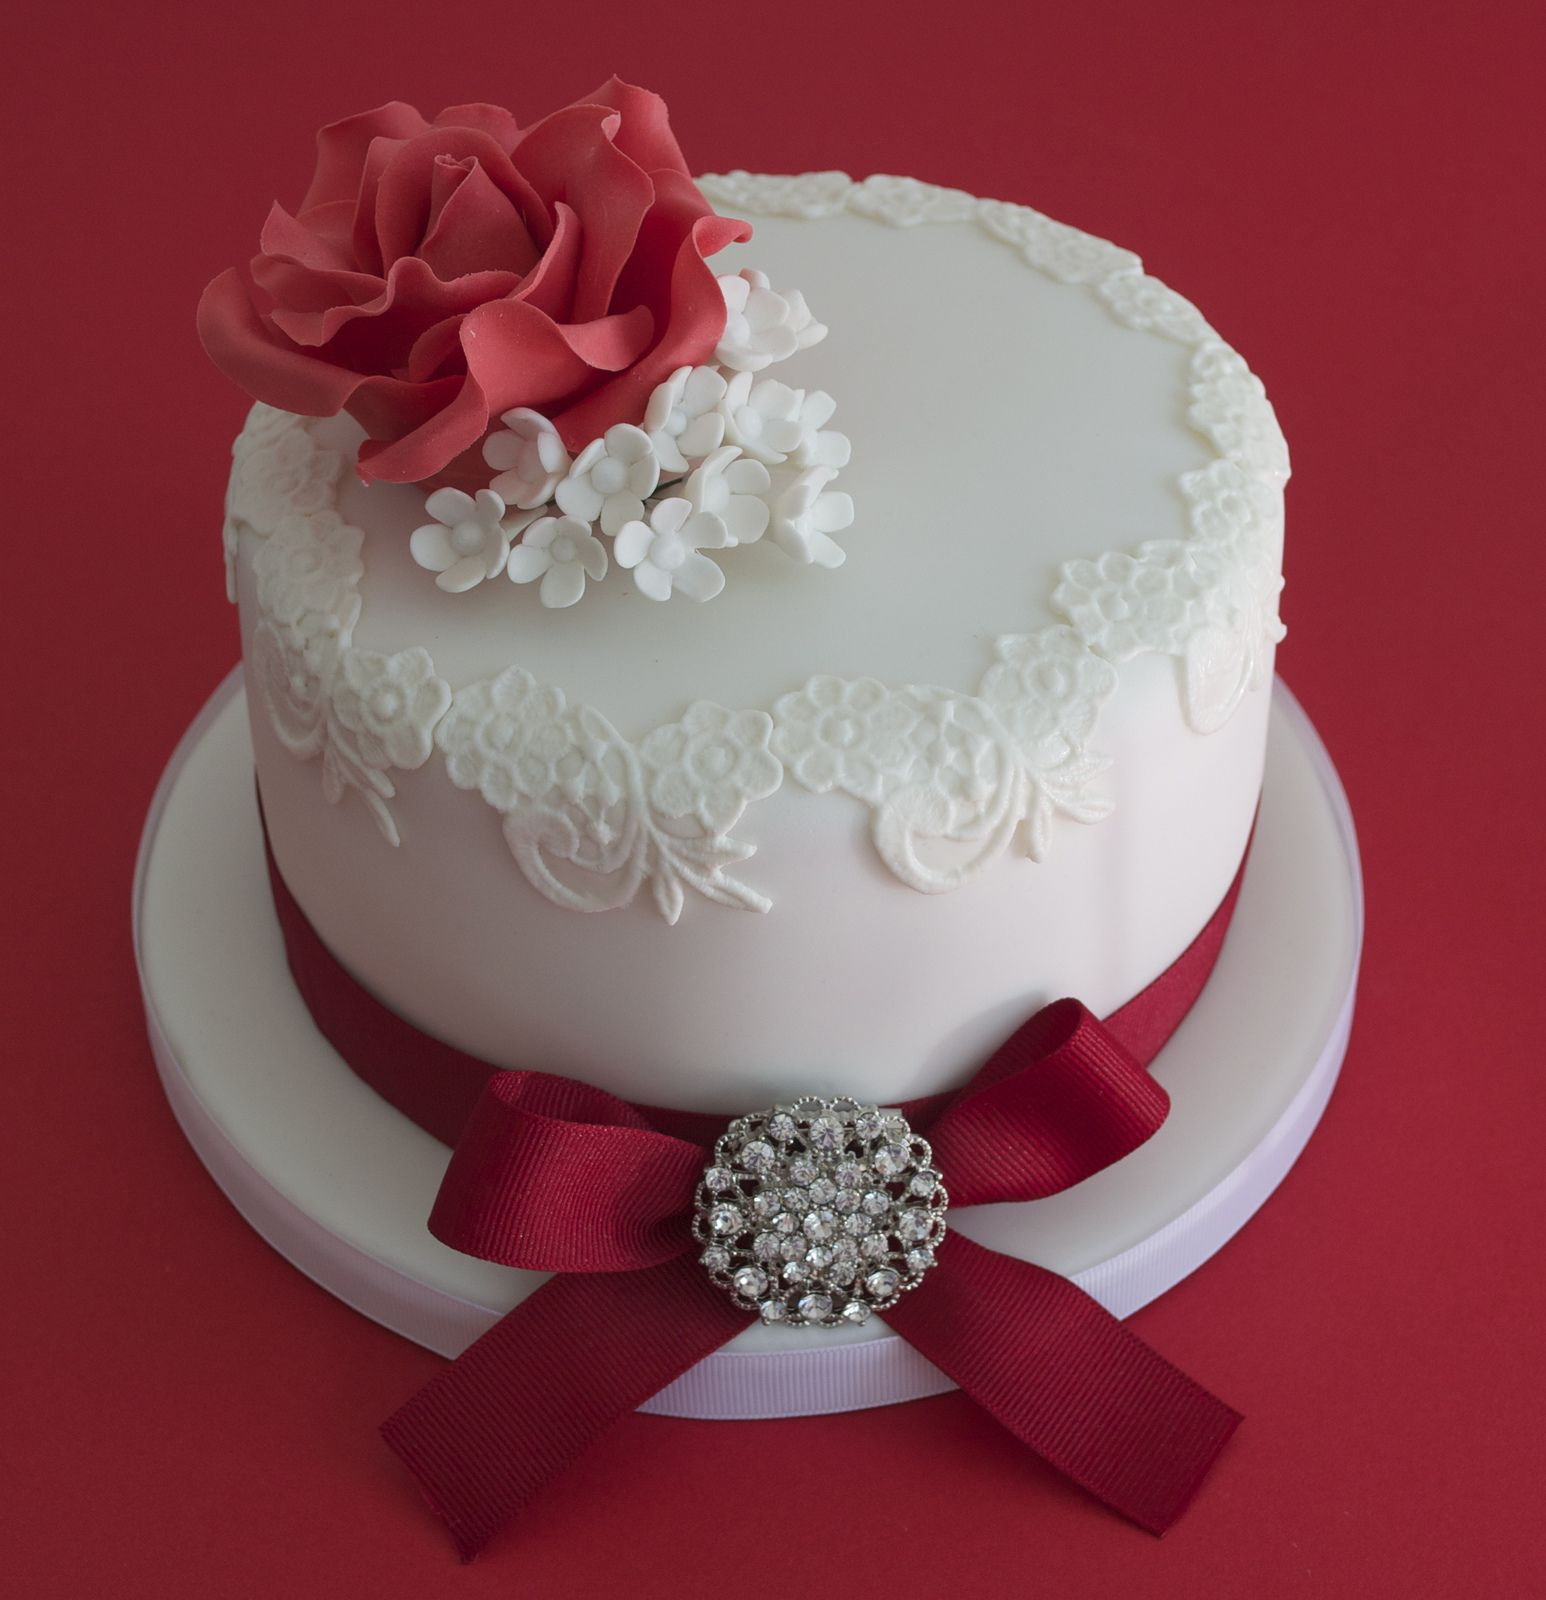 Ruby Wedding Anniversary Cake In